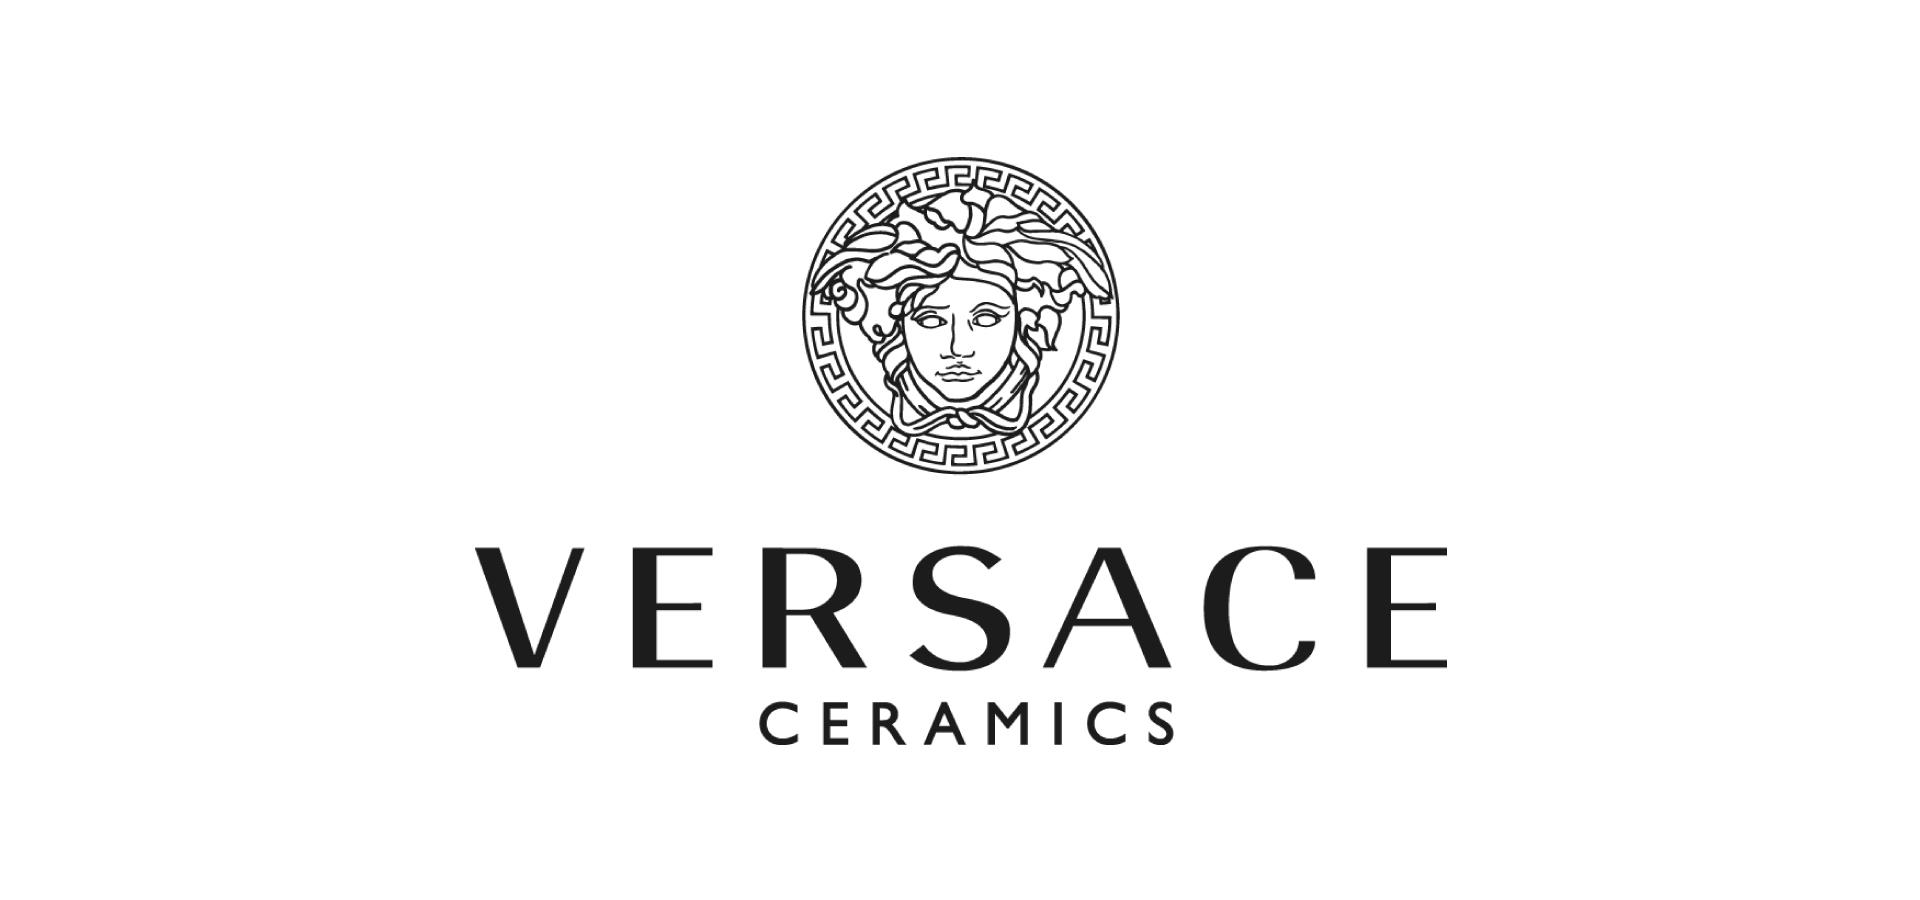 Versace Ceramics Logo